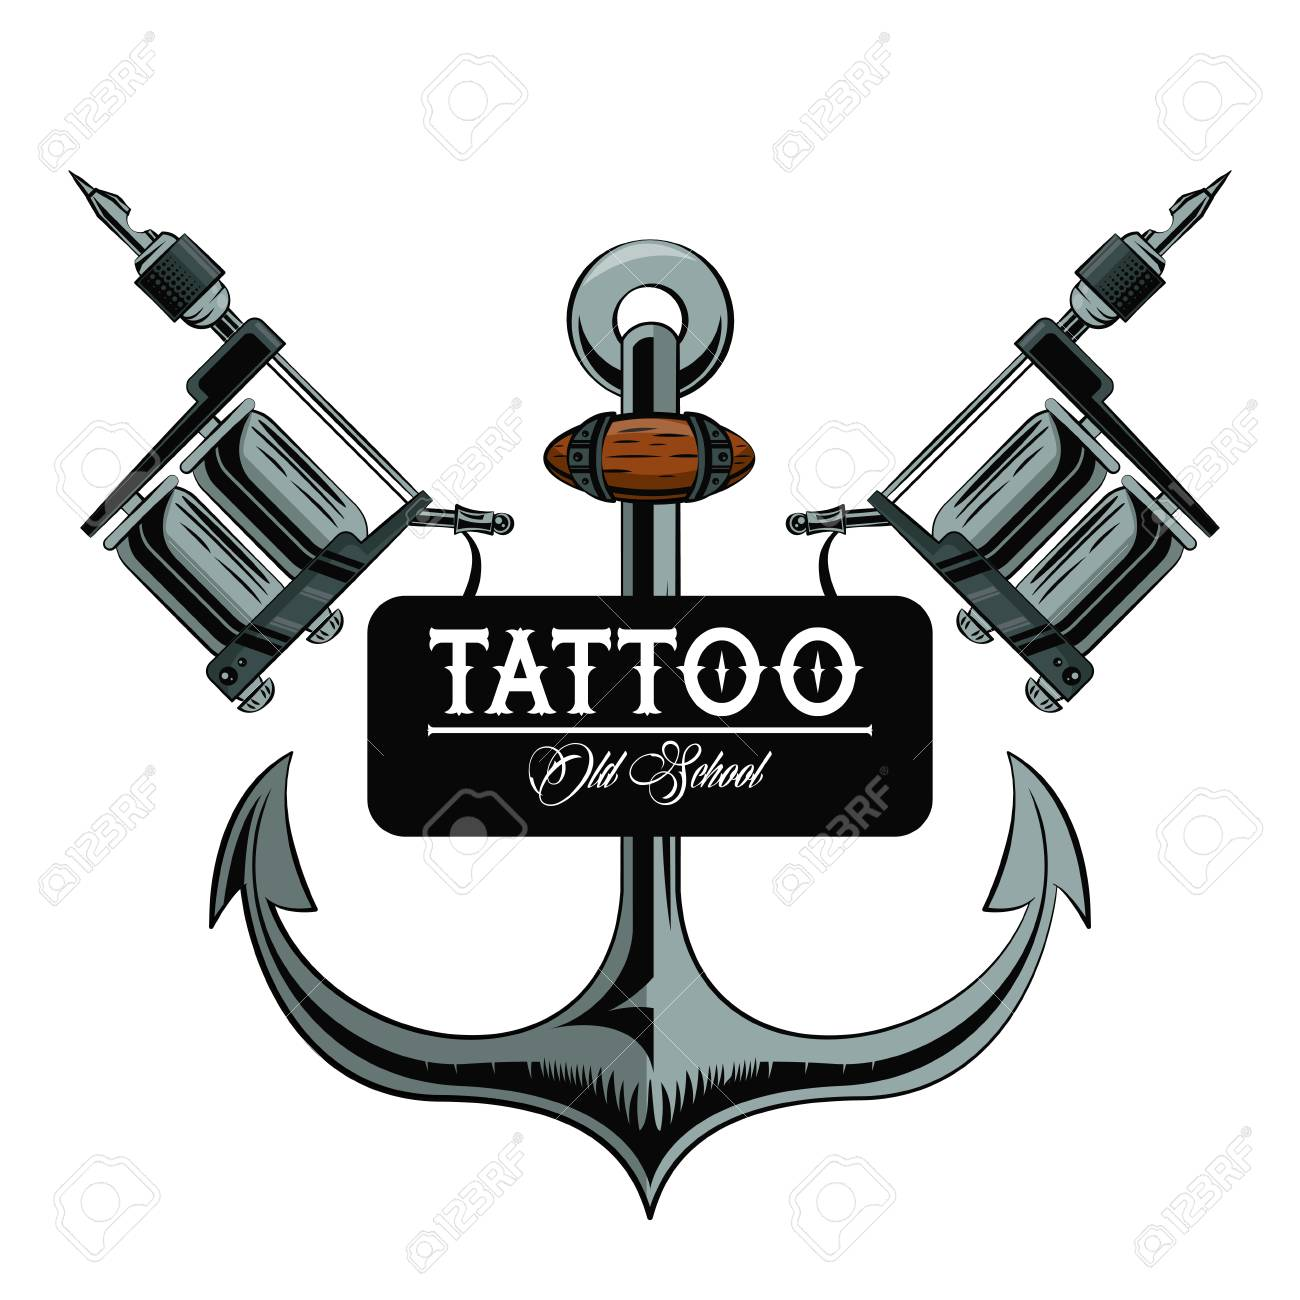 Old School Tattoo Marine Anchor Drawing Design Vector Illustration